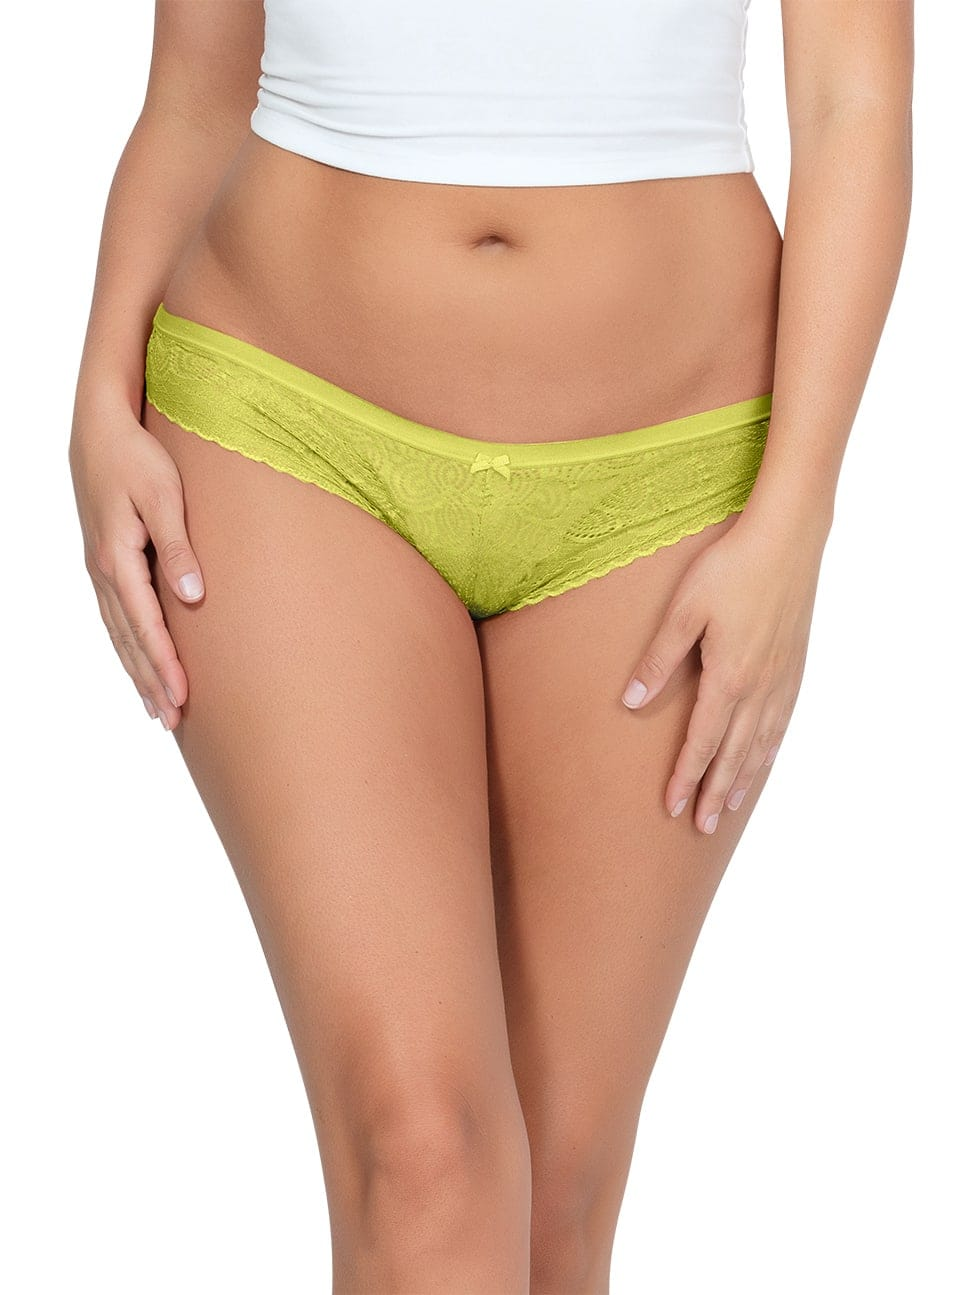 PARFAIT ParfaitPanty SoGlam BikiniPP302 Lemonade front - Parfait Panty So Glam Bikini - Lemonade - PP302